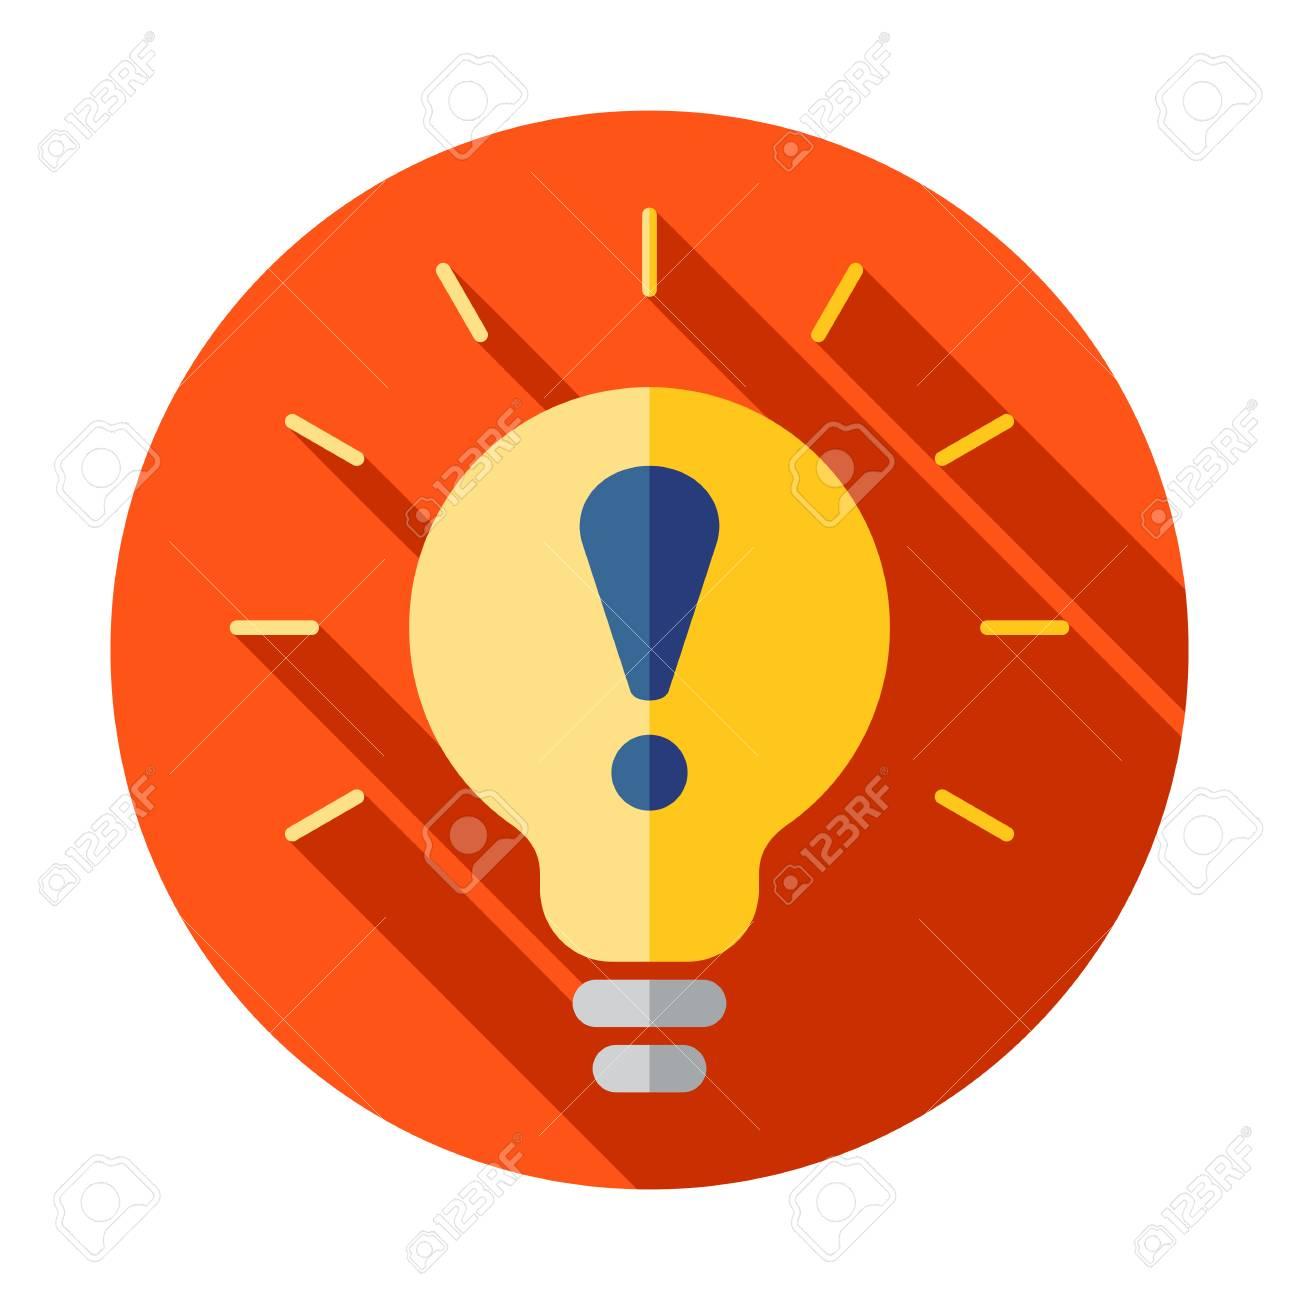 Warning light bulb illustration design over a white background - 127520762